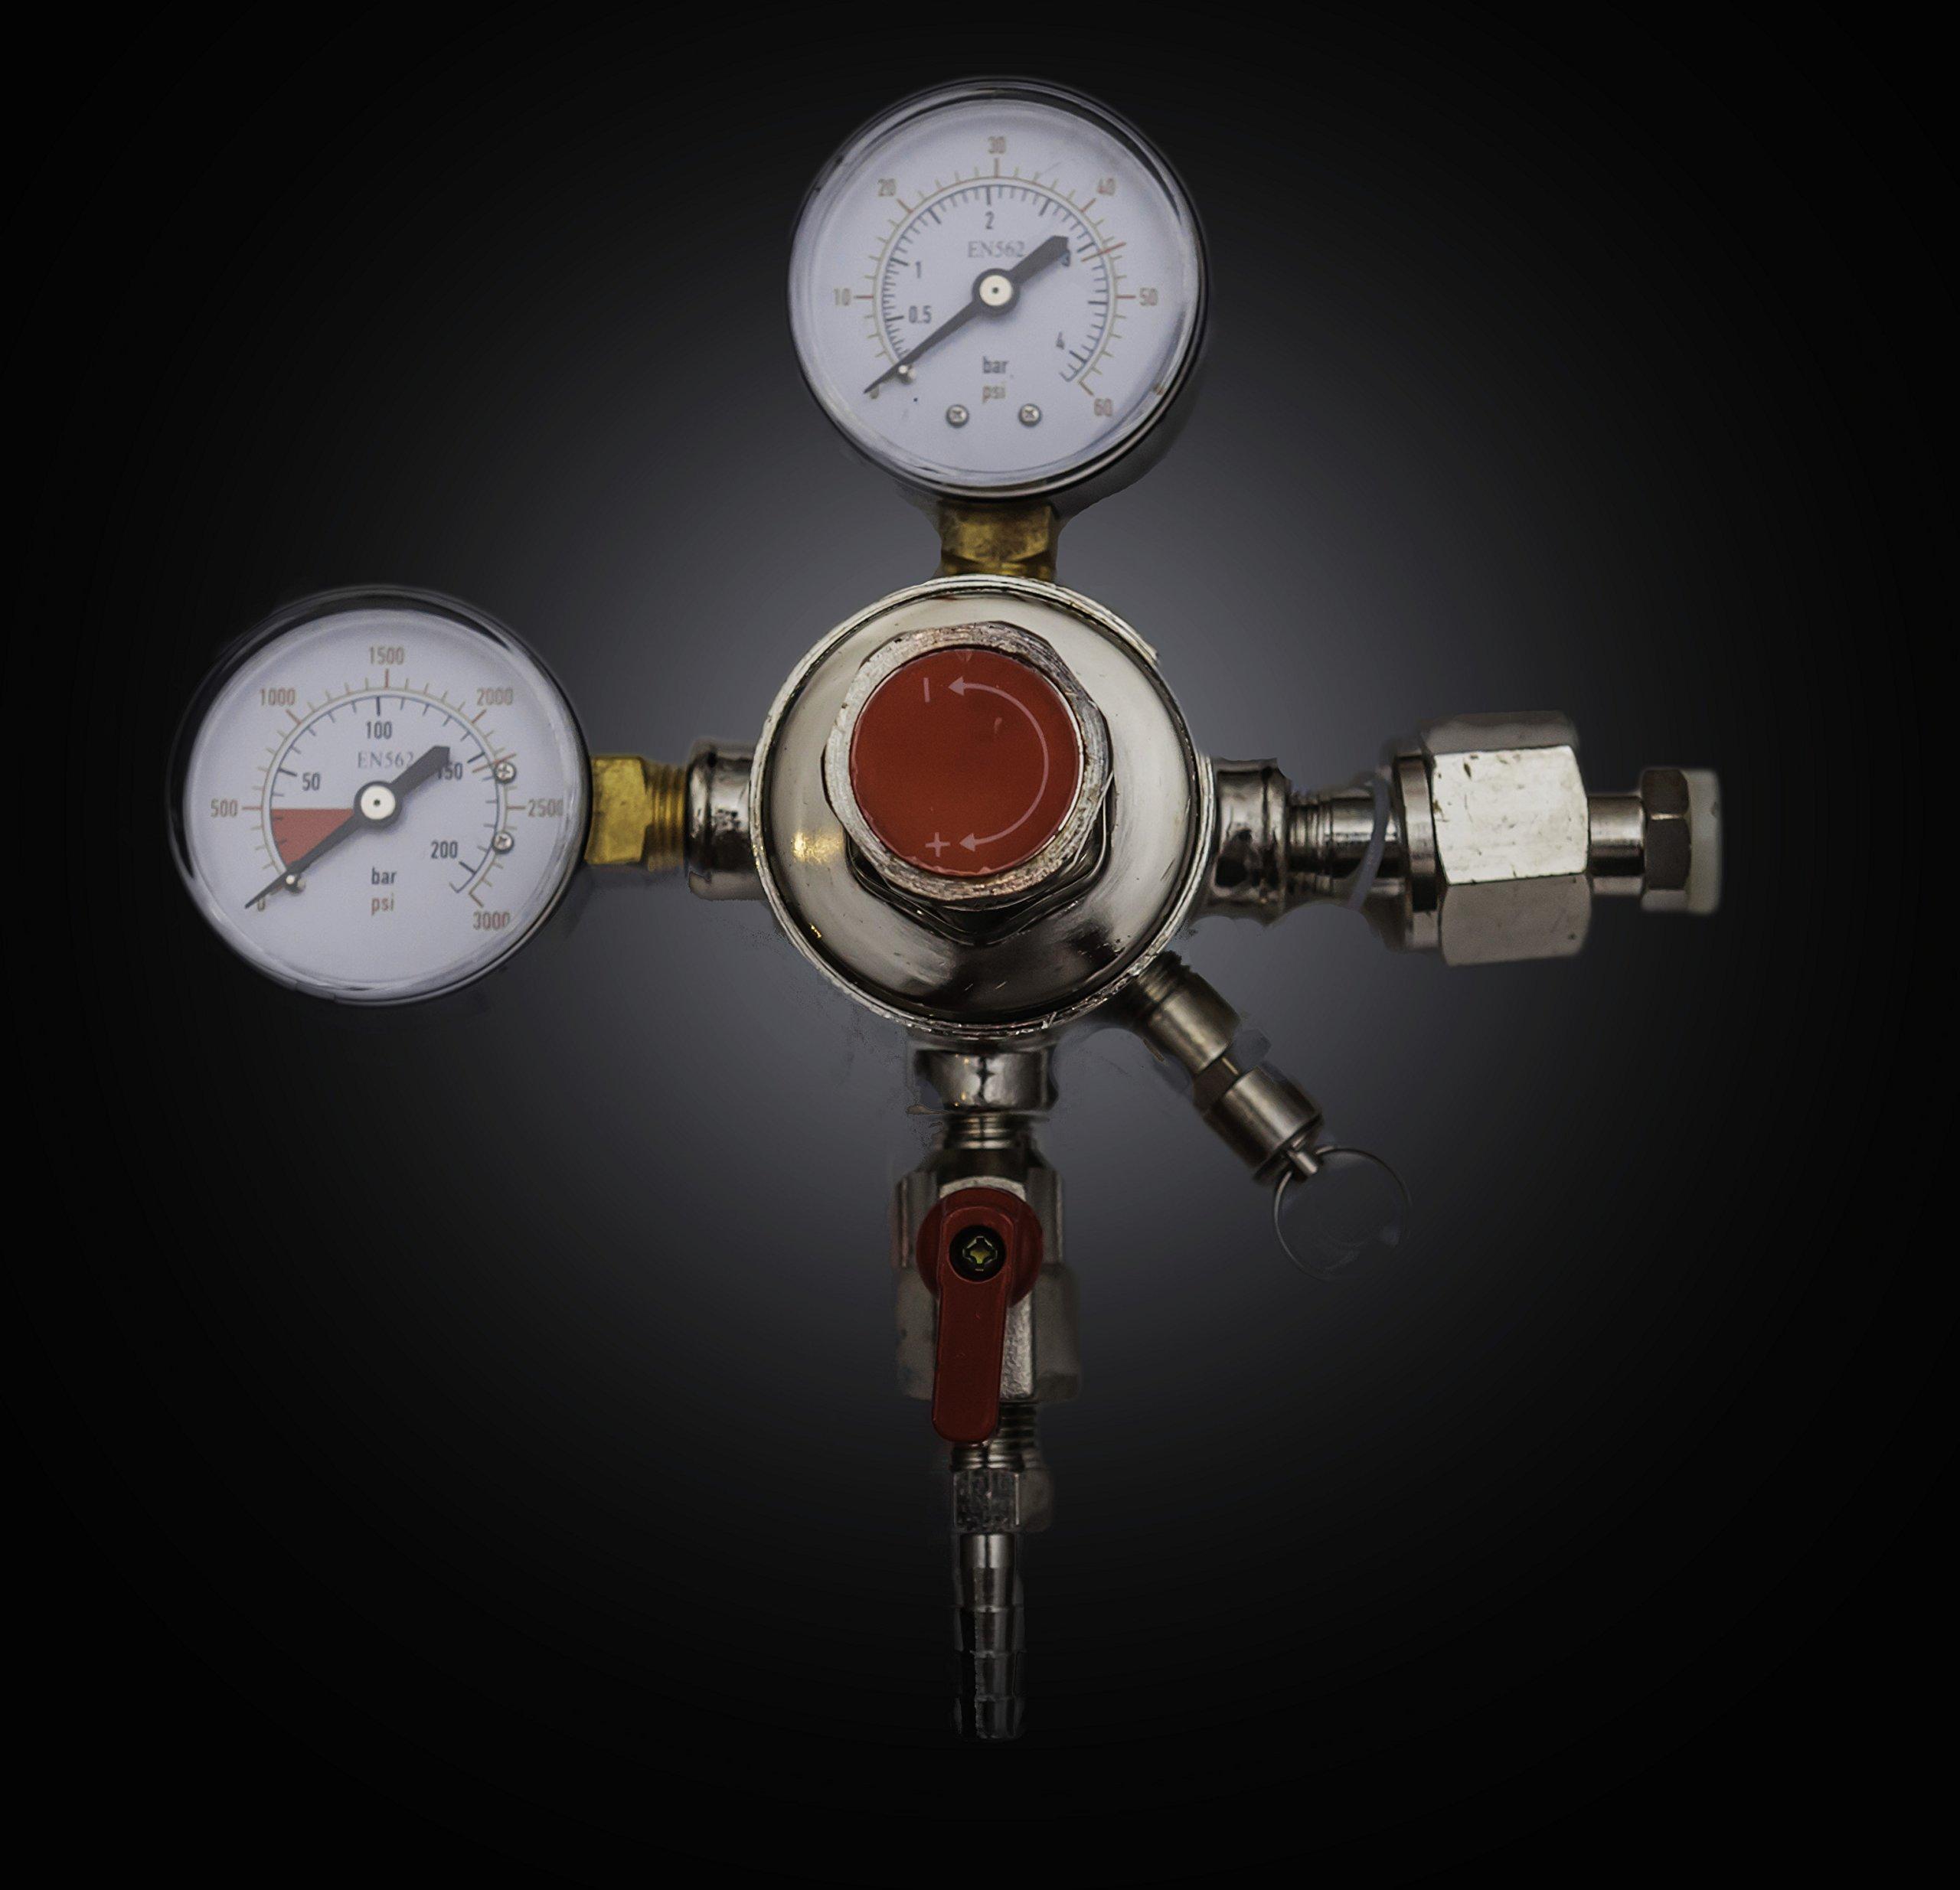 Brewin Dual Gauge Co2 Draft Beer Dispensing Regulator